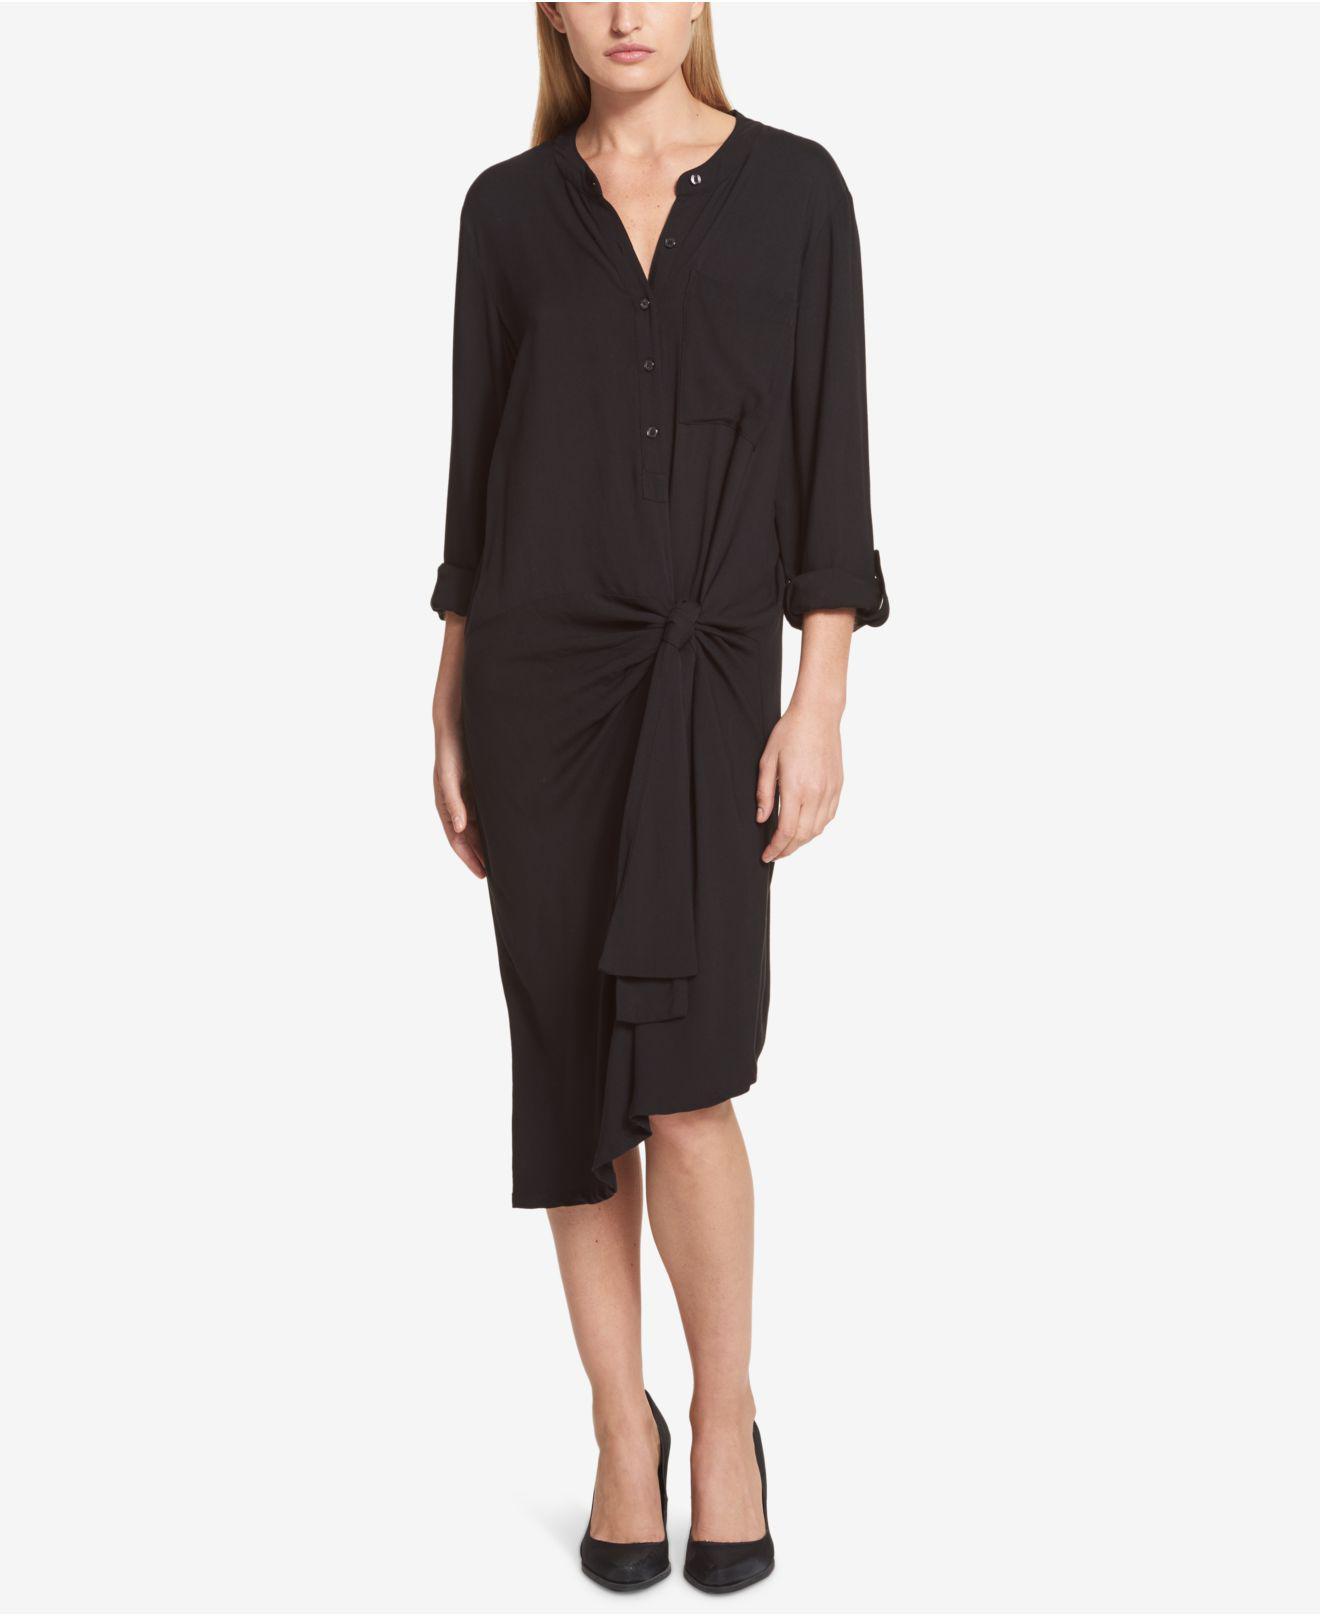 e8c1aa61fc Lyst - DKNY Side-tie Roll-tab Shirtdress in Black